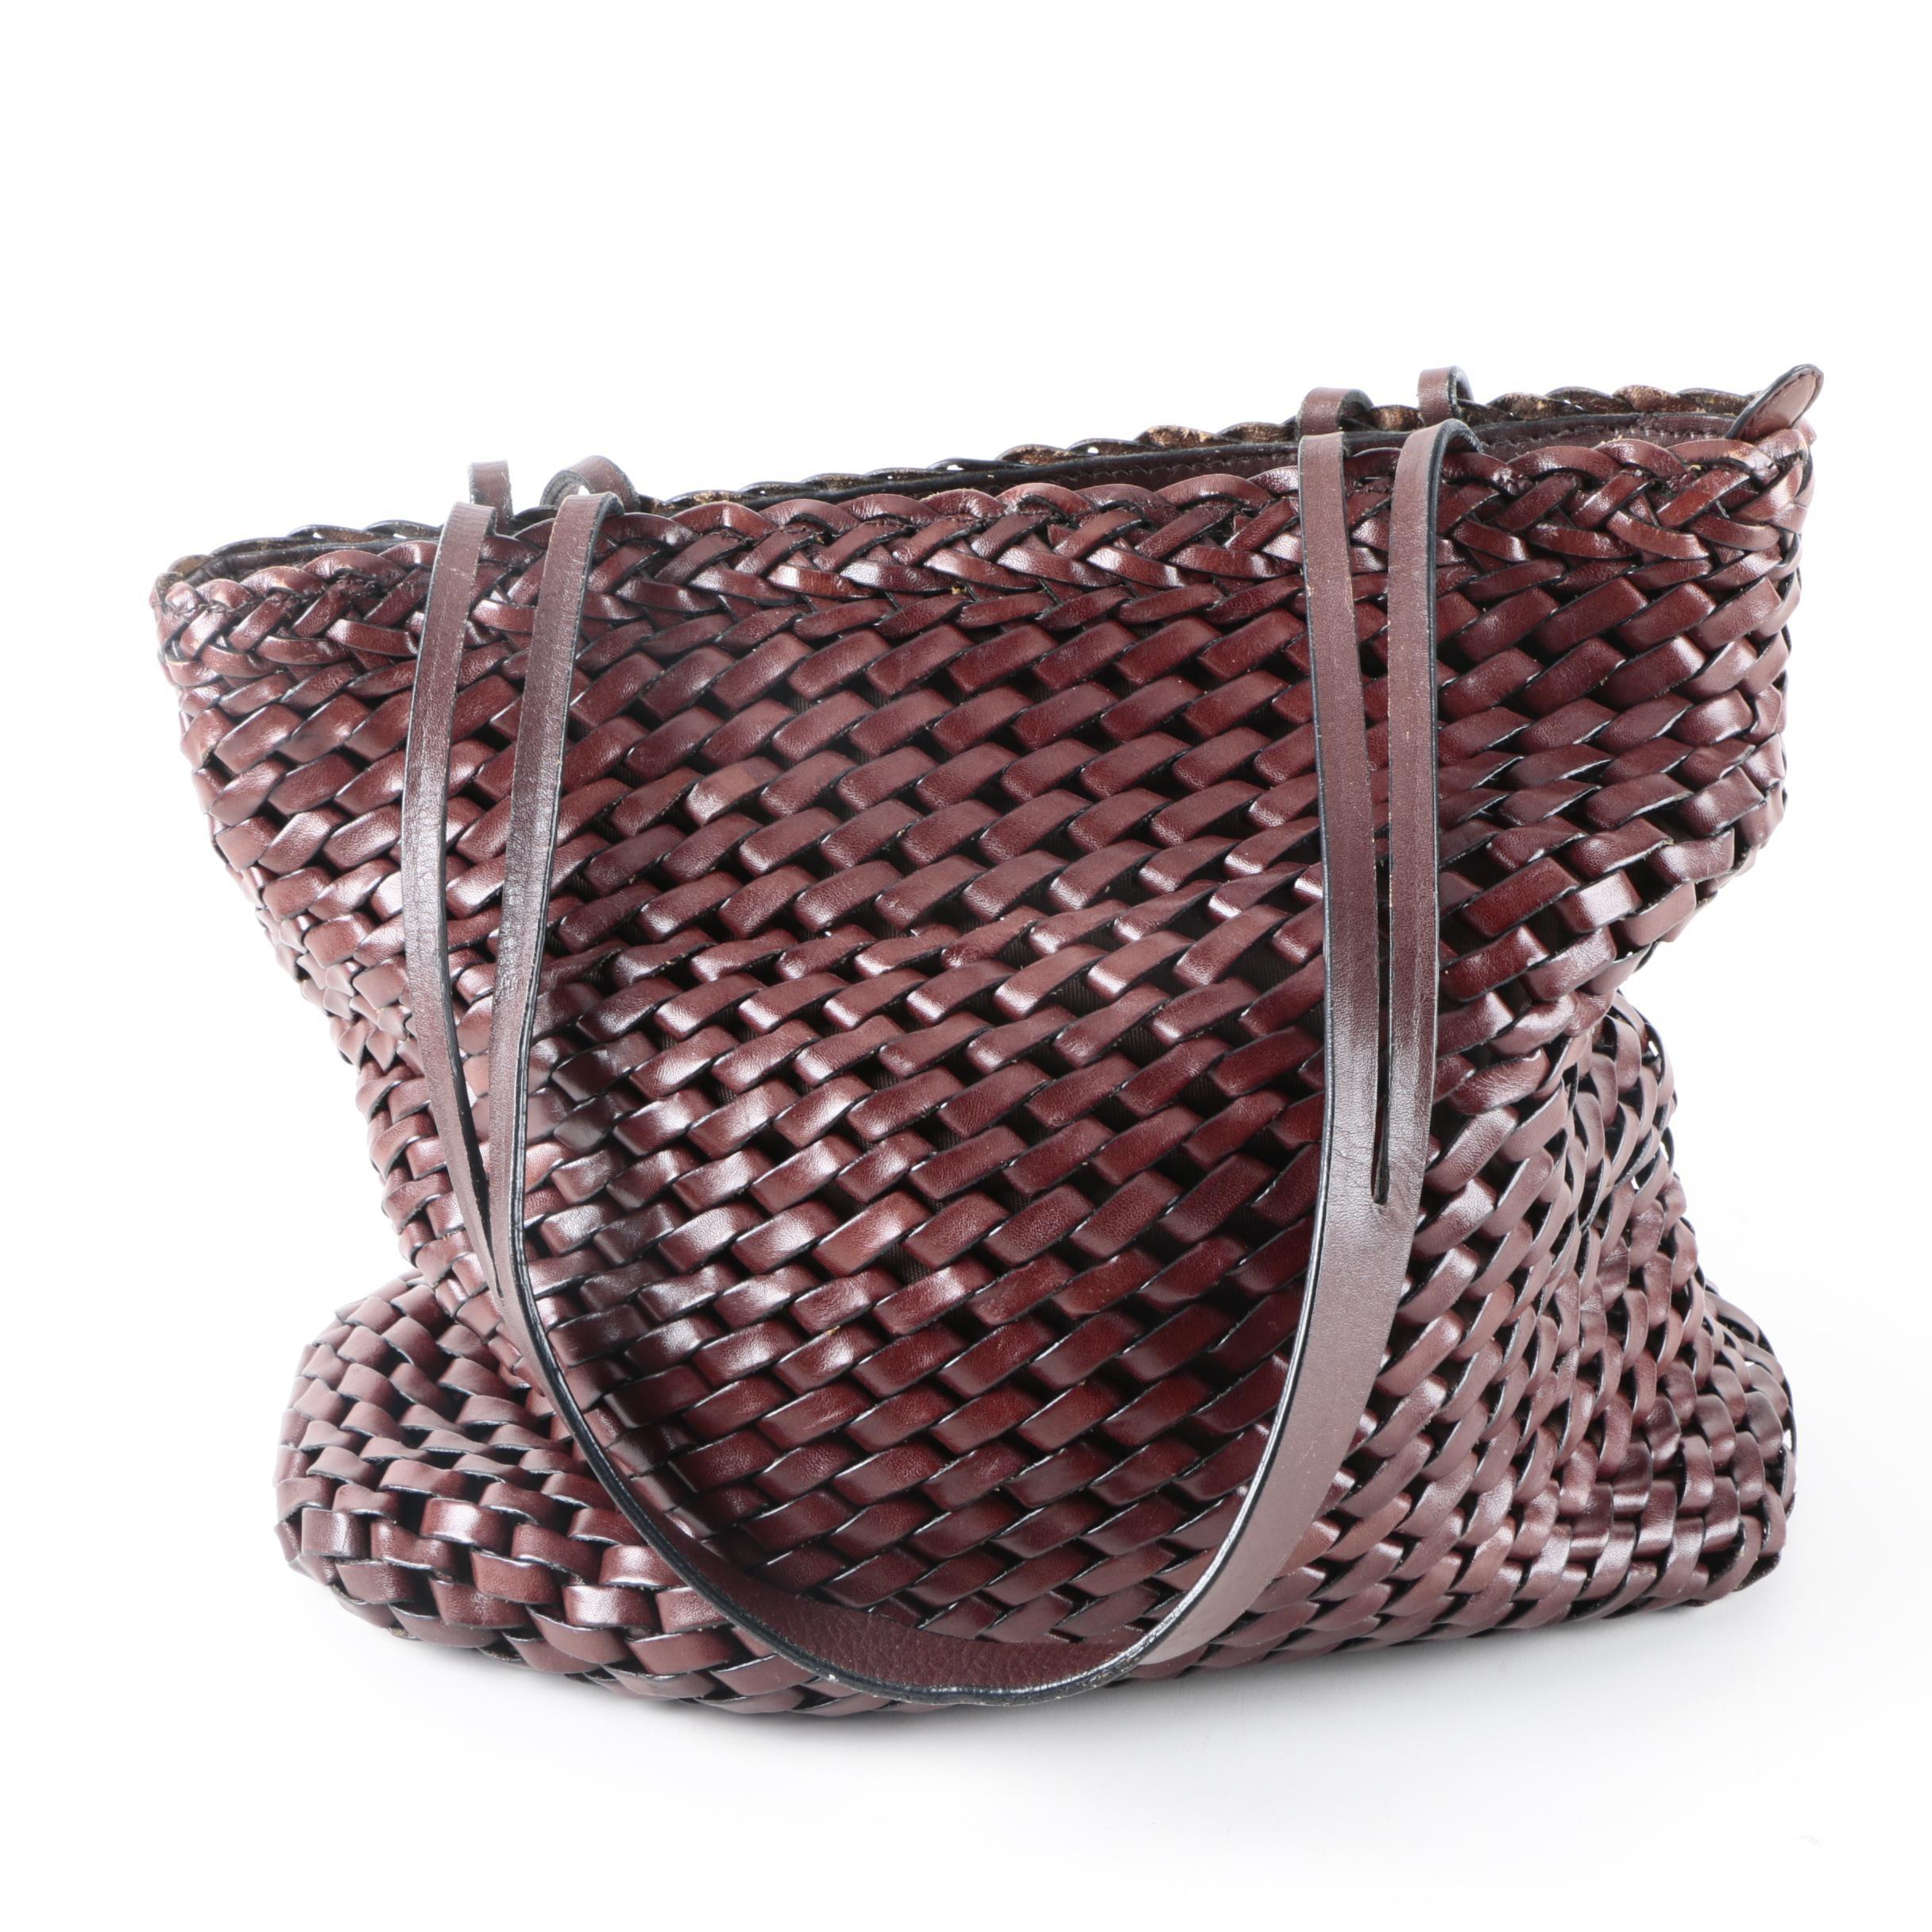 HOBO International Woven Leather Handbag